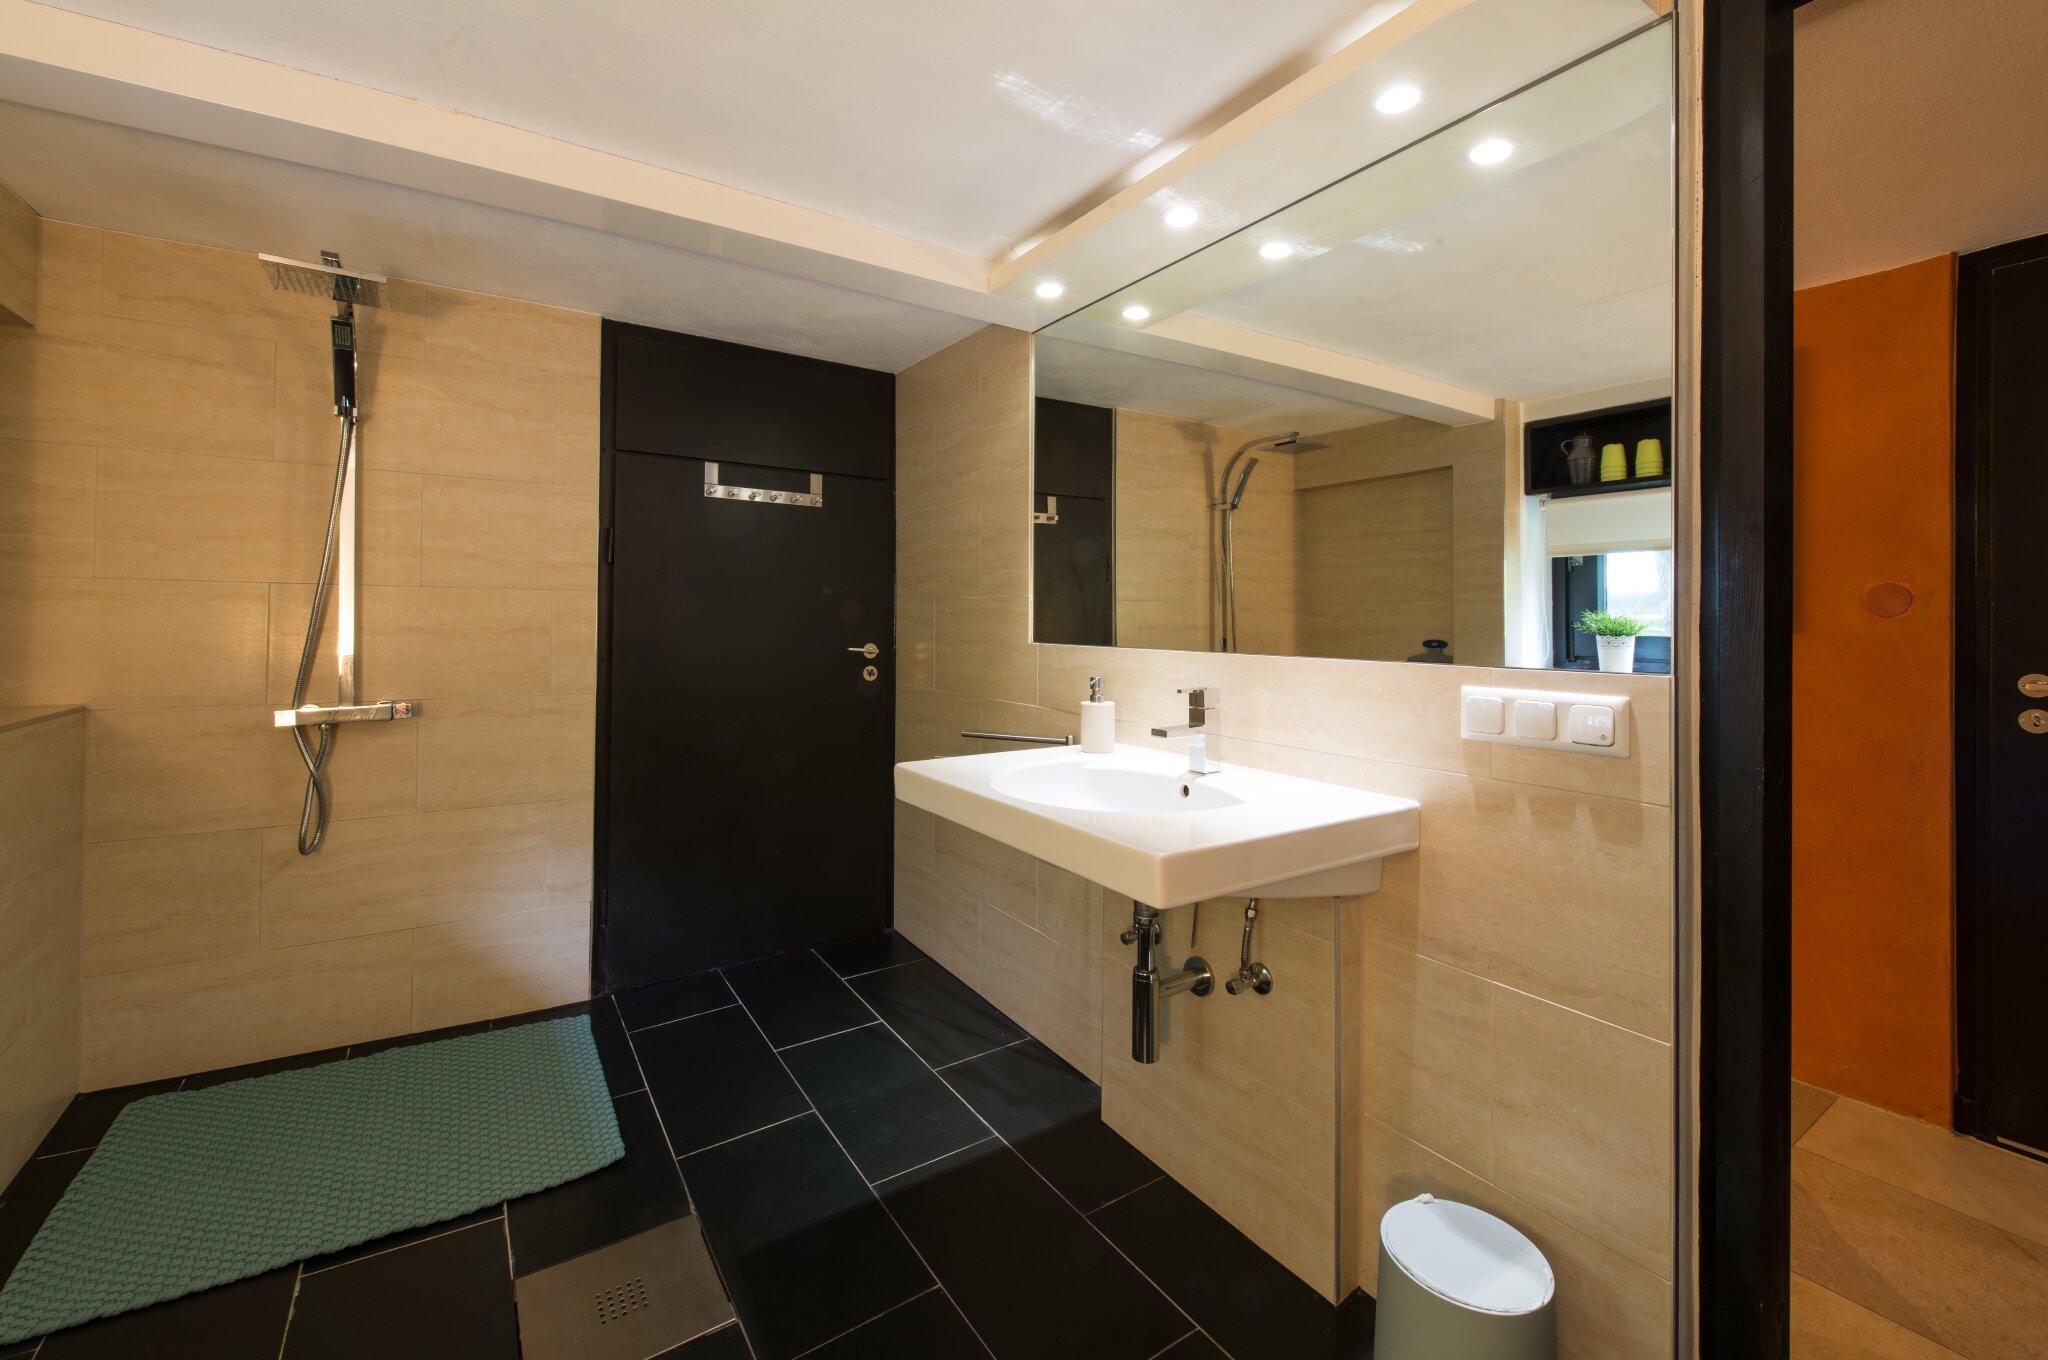 Oberes Badezimmer